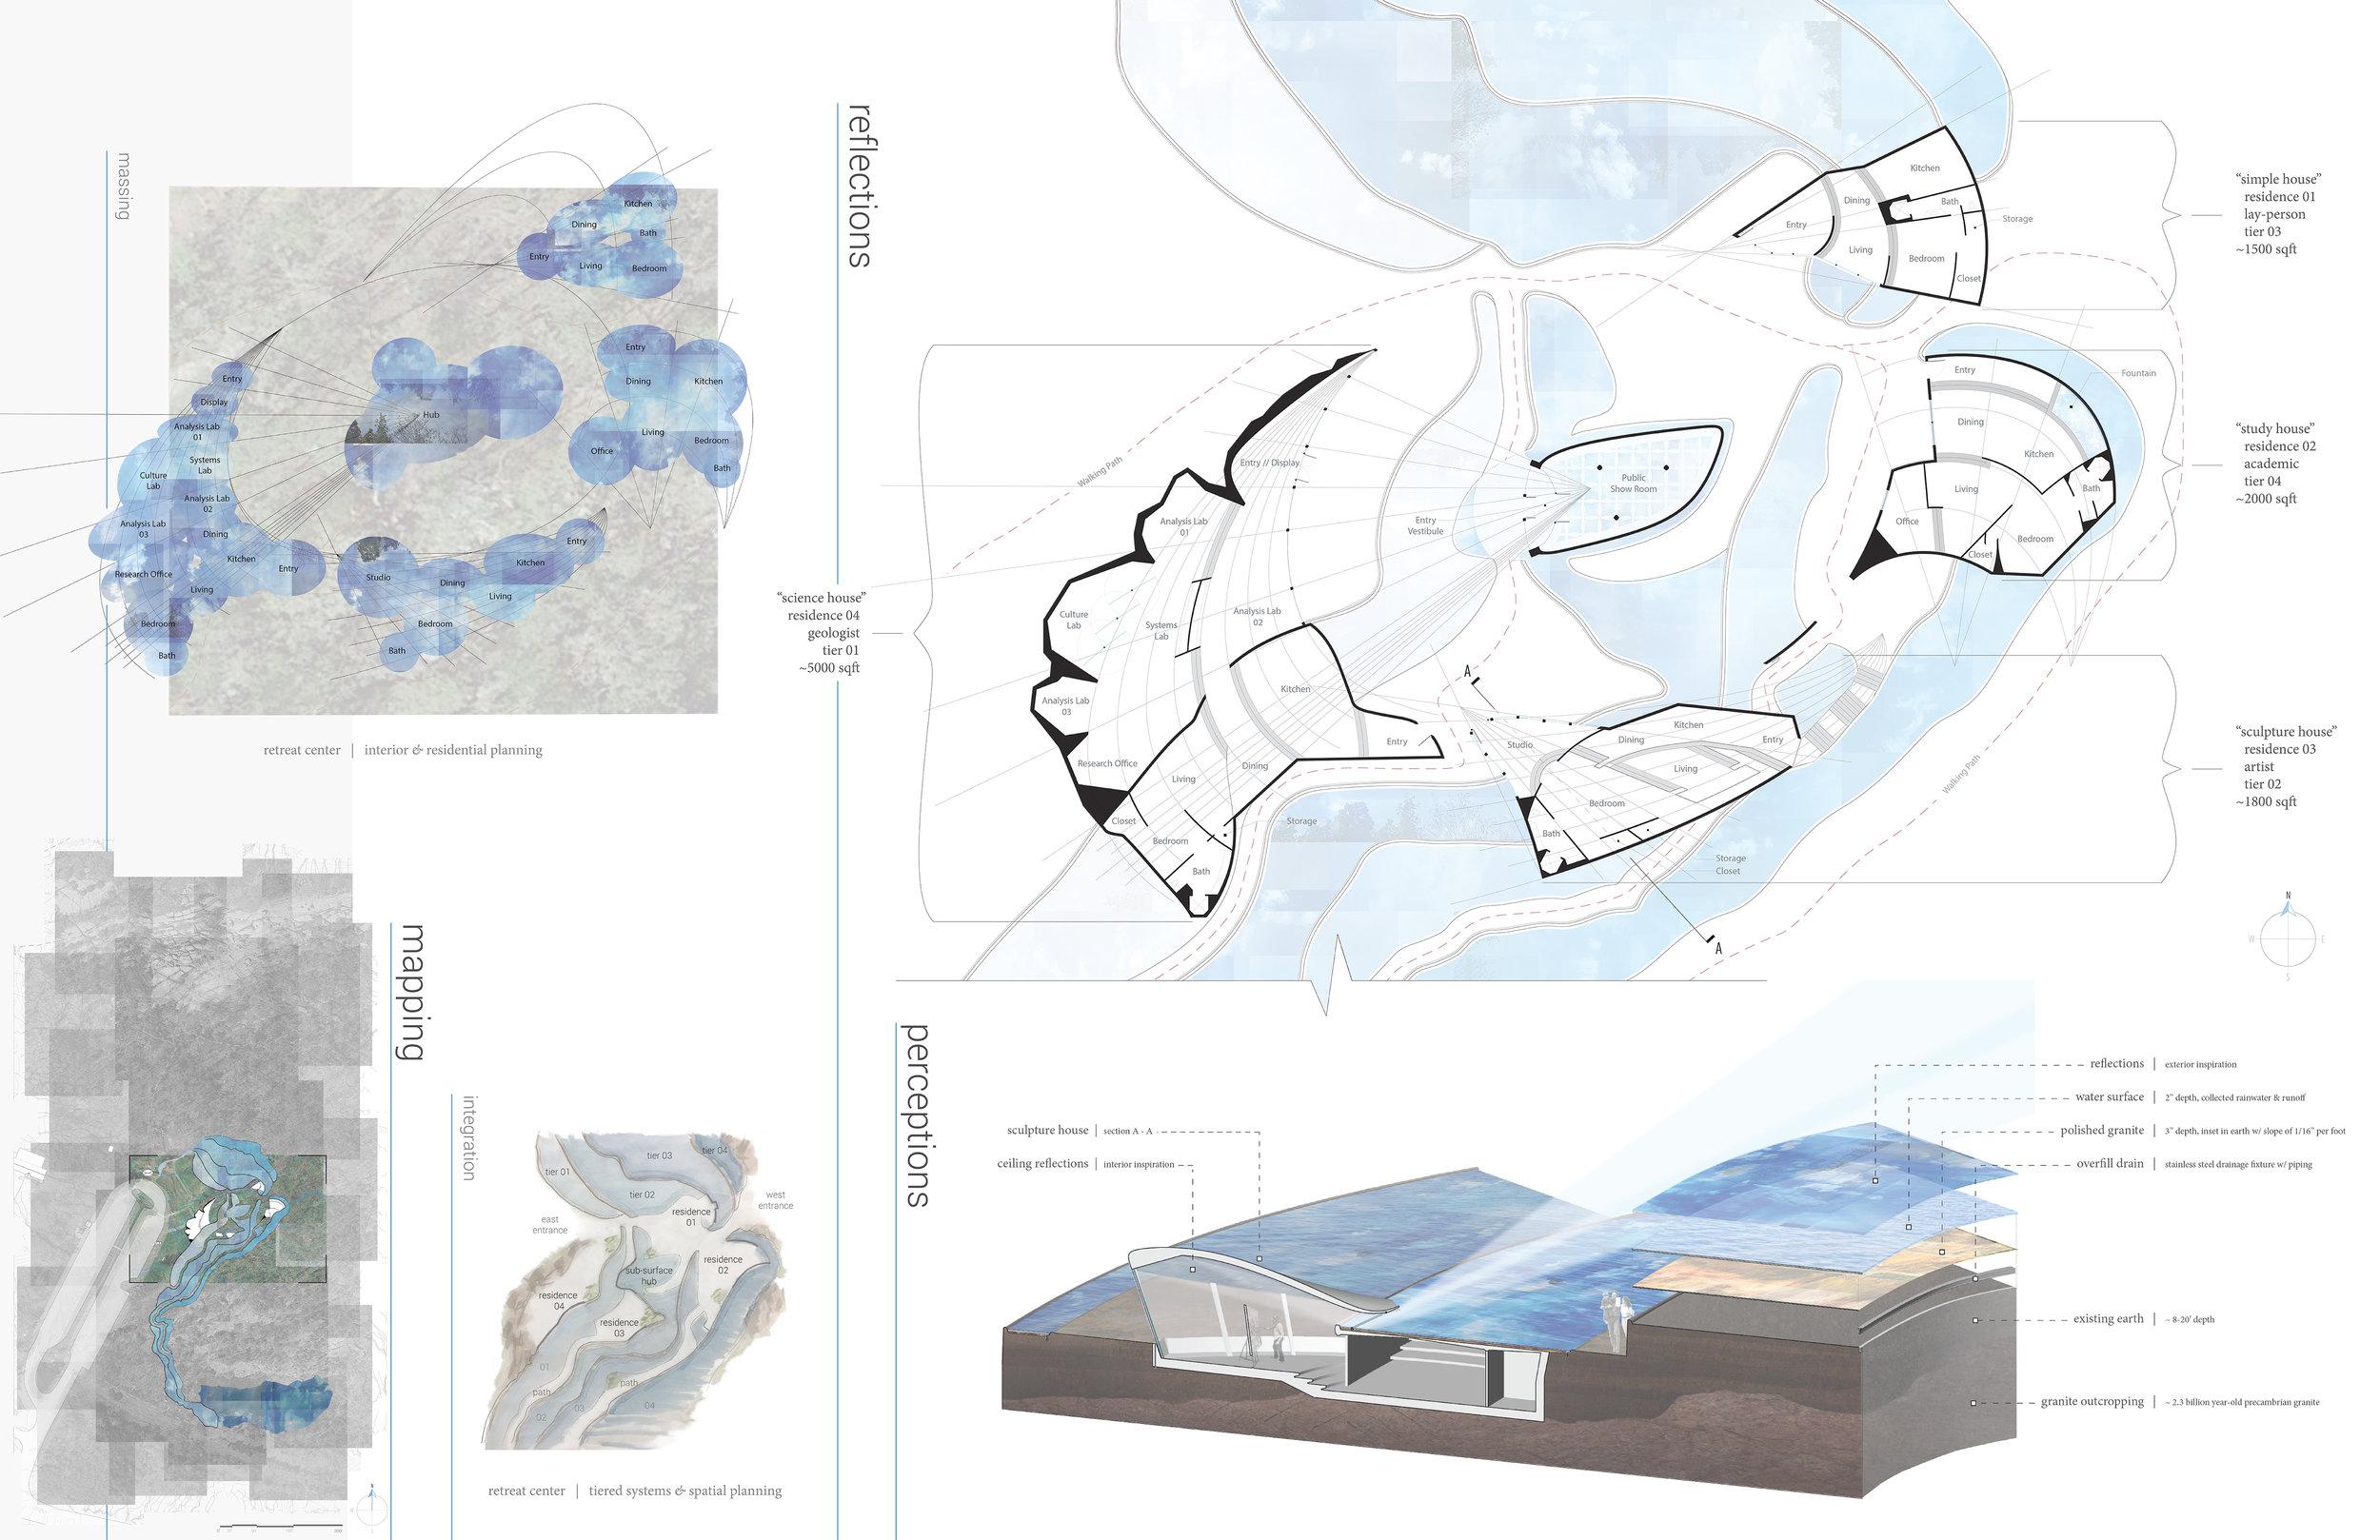 Tiered Reflections - WashU Adv. Studio III - Landscape Architecture - Elephant Rocks State Park, MOcommunal retreat center2016